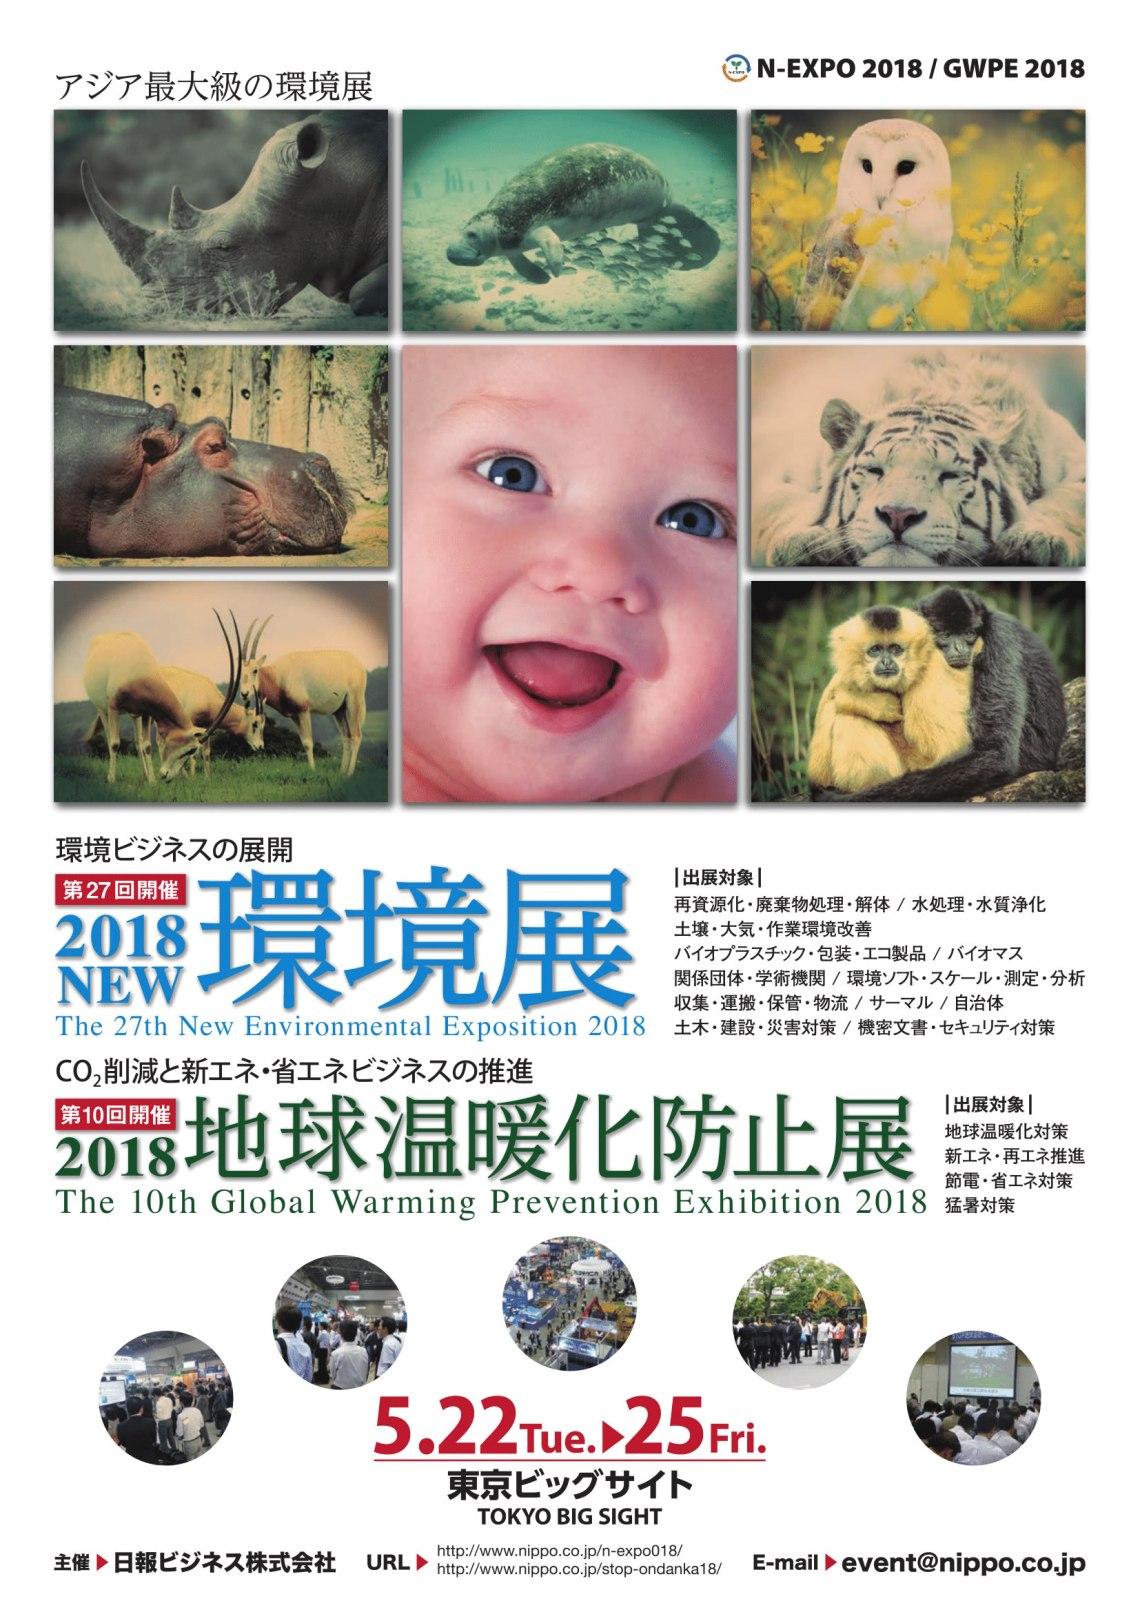 new環境展 2018 ポスター Biogreen 熱分解装置 2018.4.1